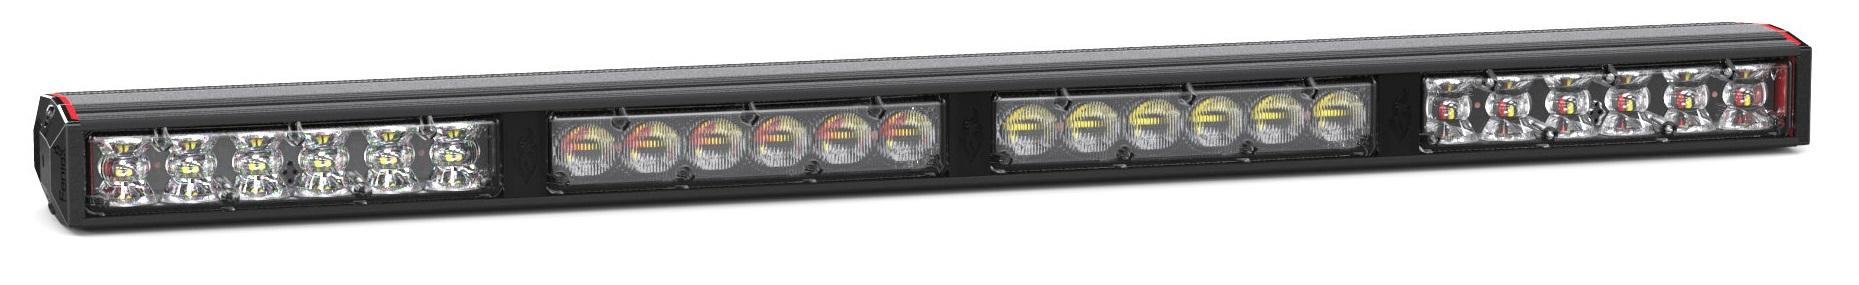 feniex-fusion-400-lightstick-2-short.jpg